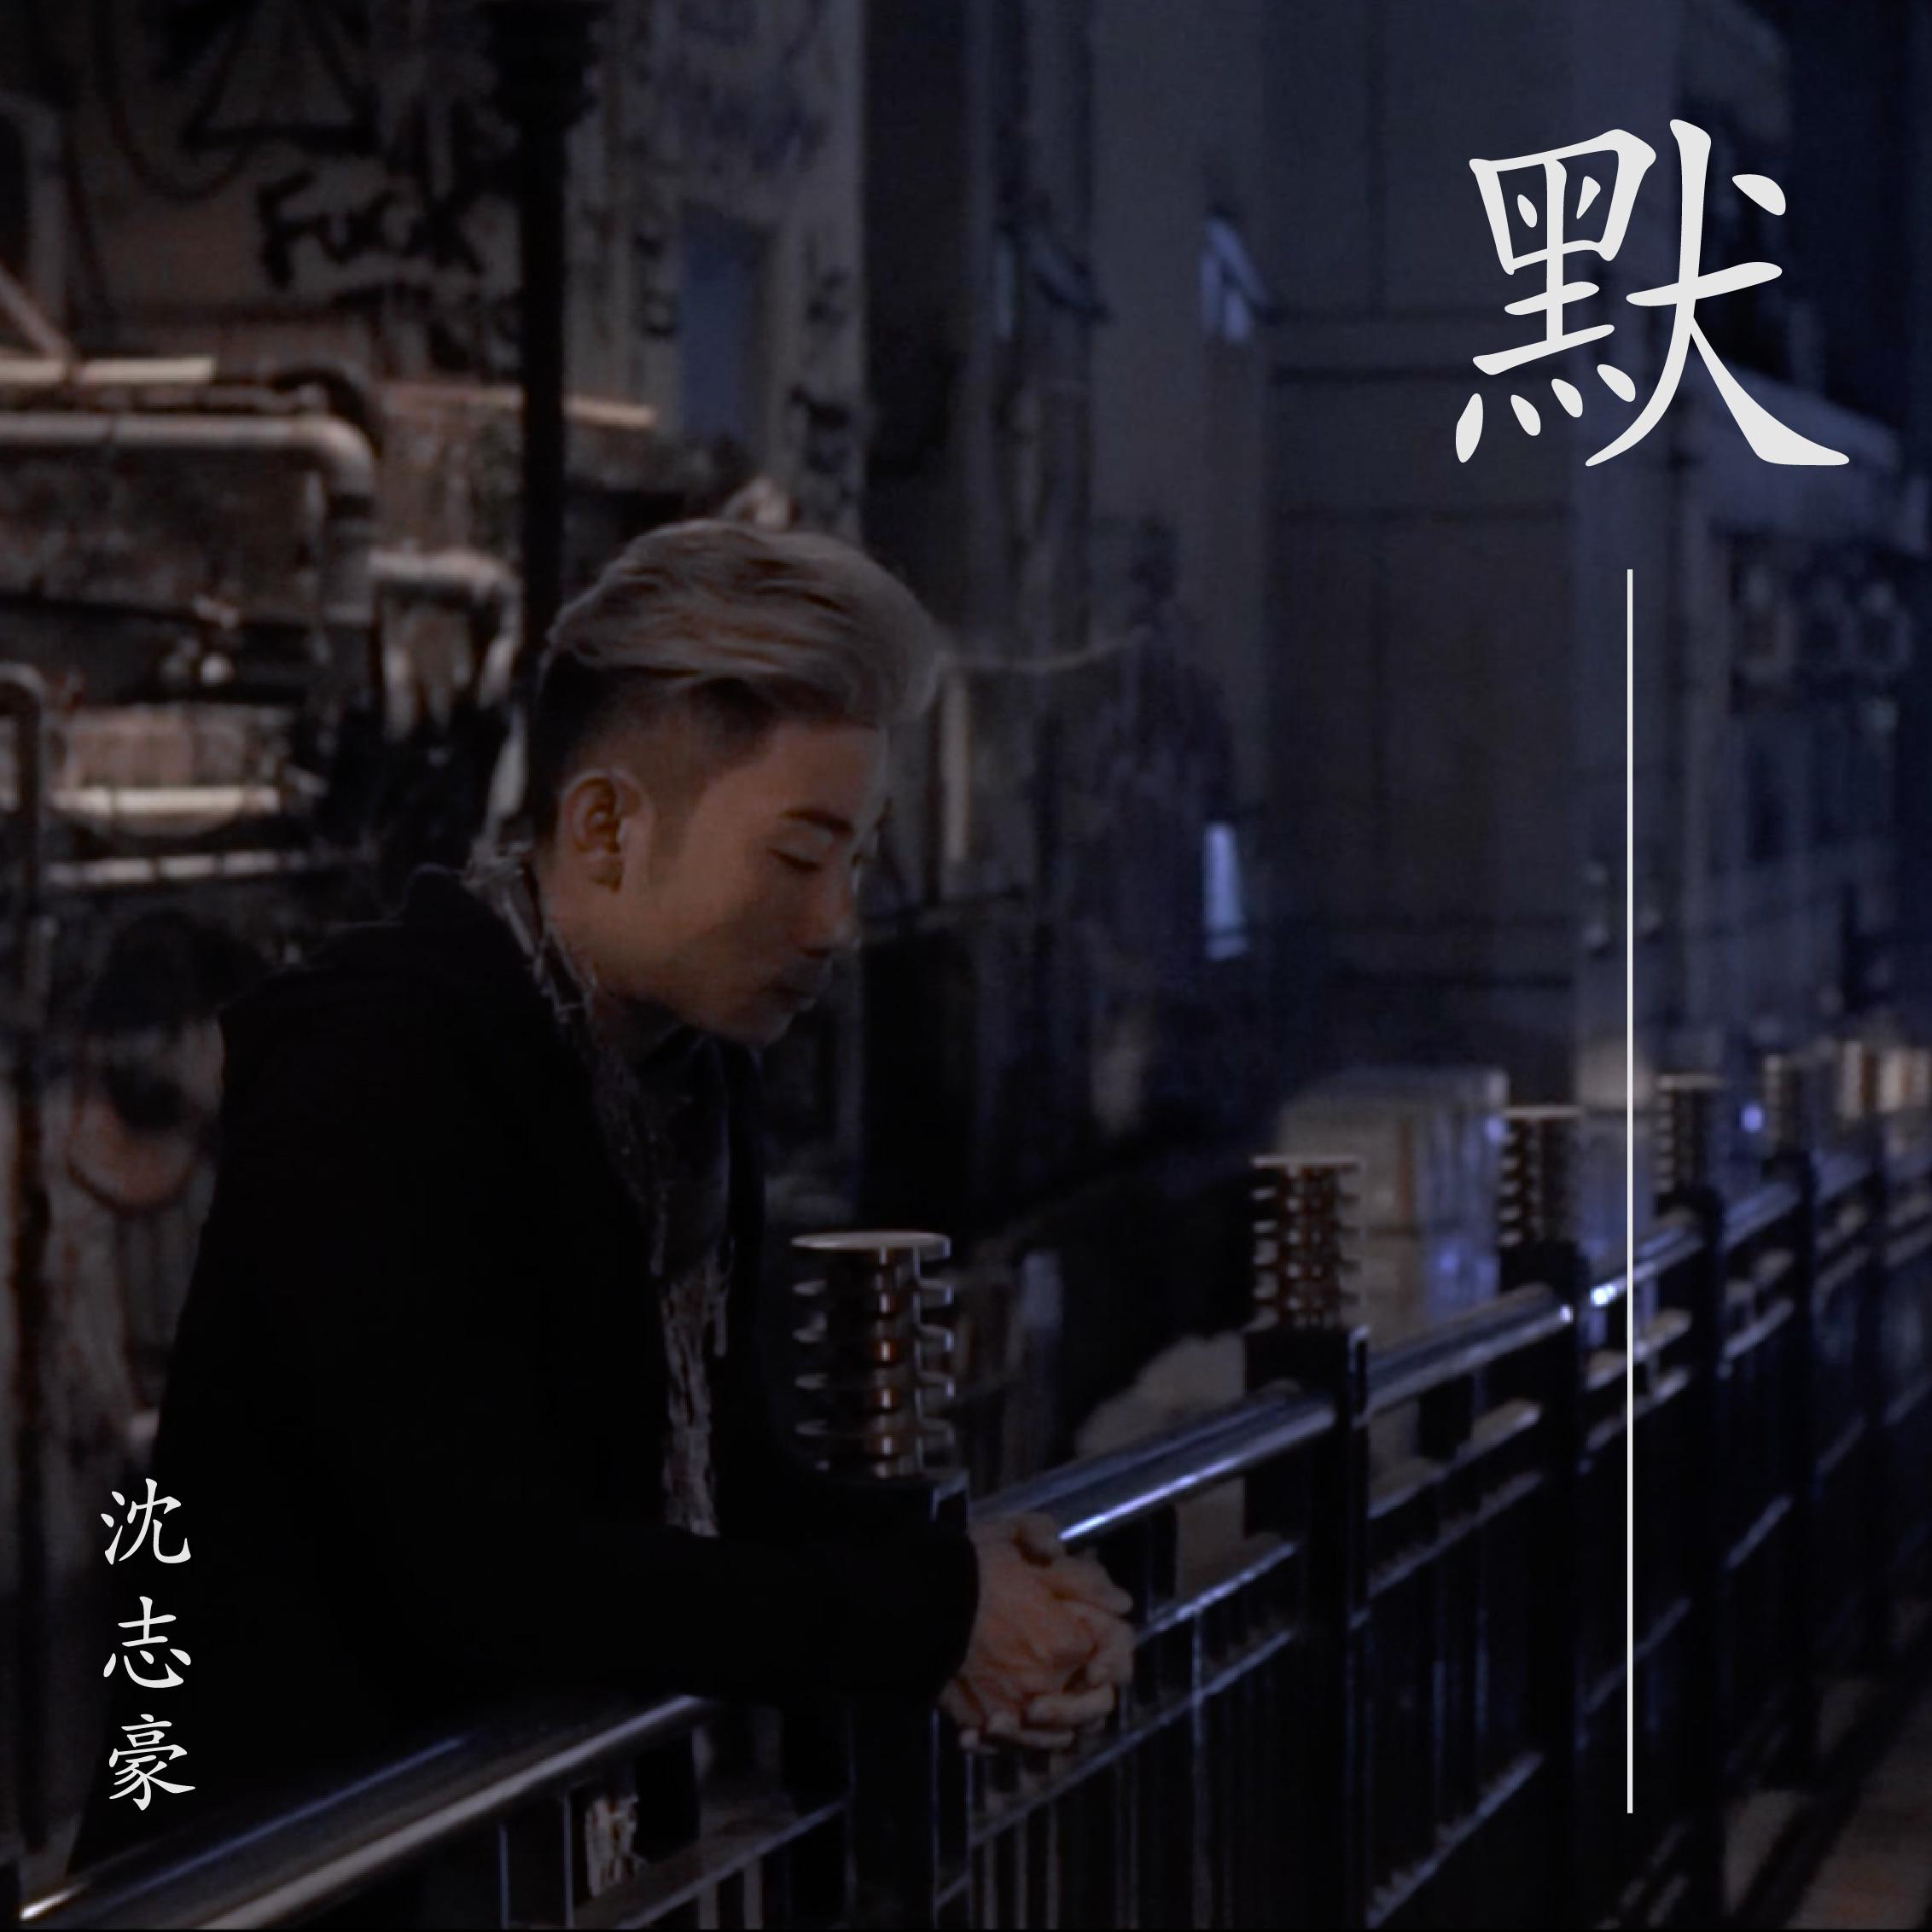 默 - Single (2018)